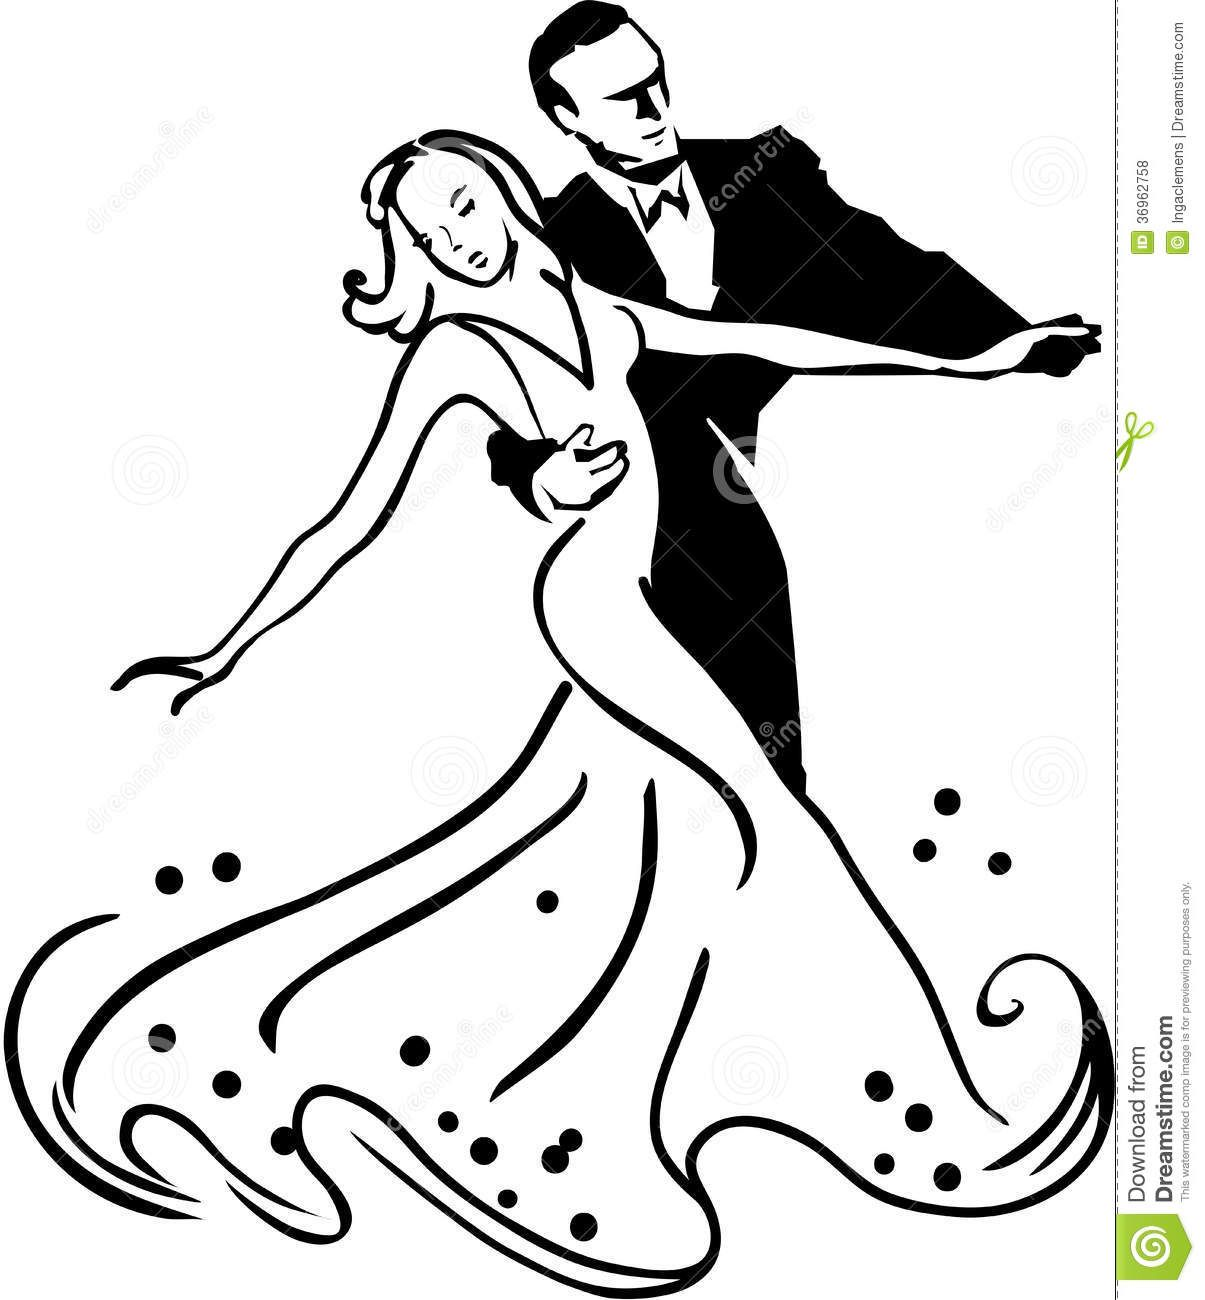 Dancing Drawings Drawings Dancing Drawing